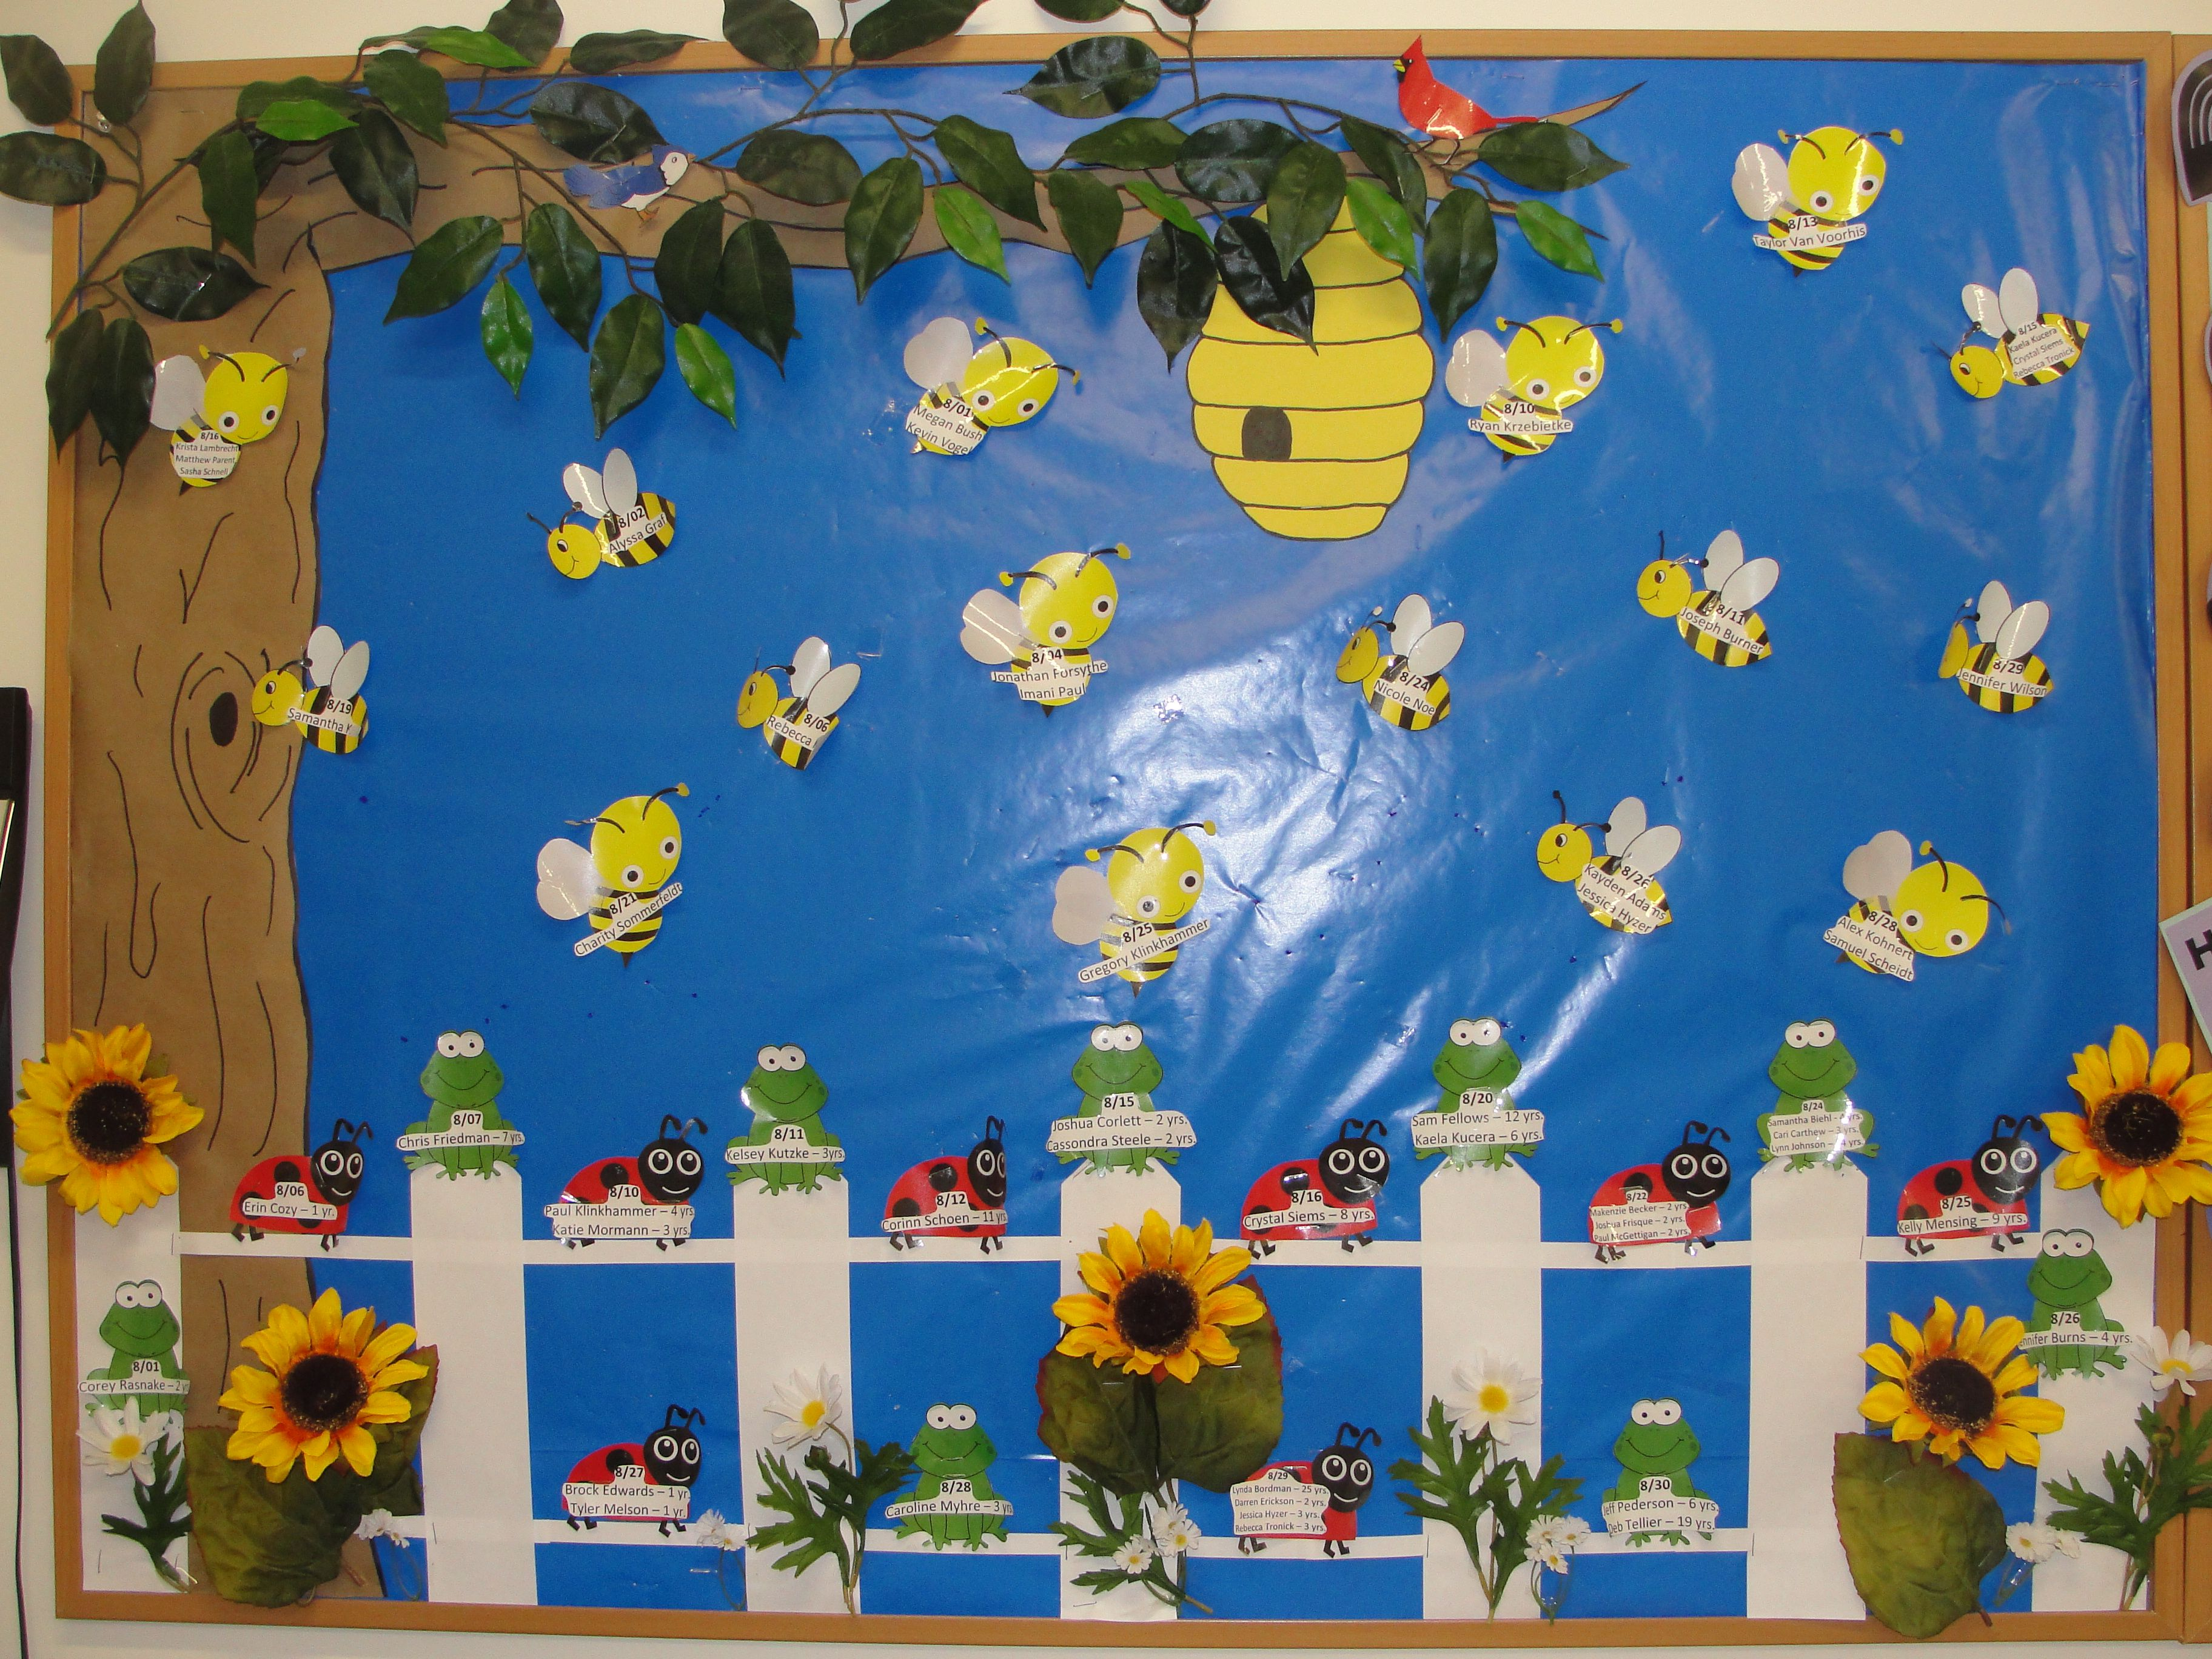 Ladybug Classroom Decoration Ideas : Hollywood themed classroom ideas printable classroom